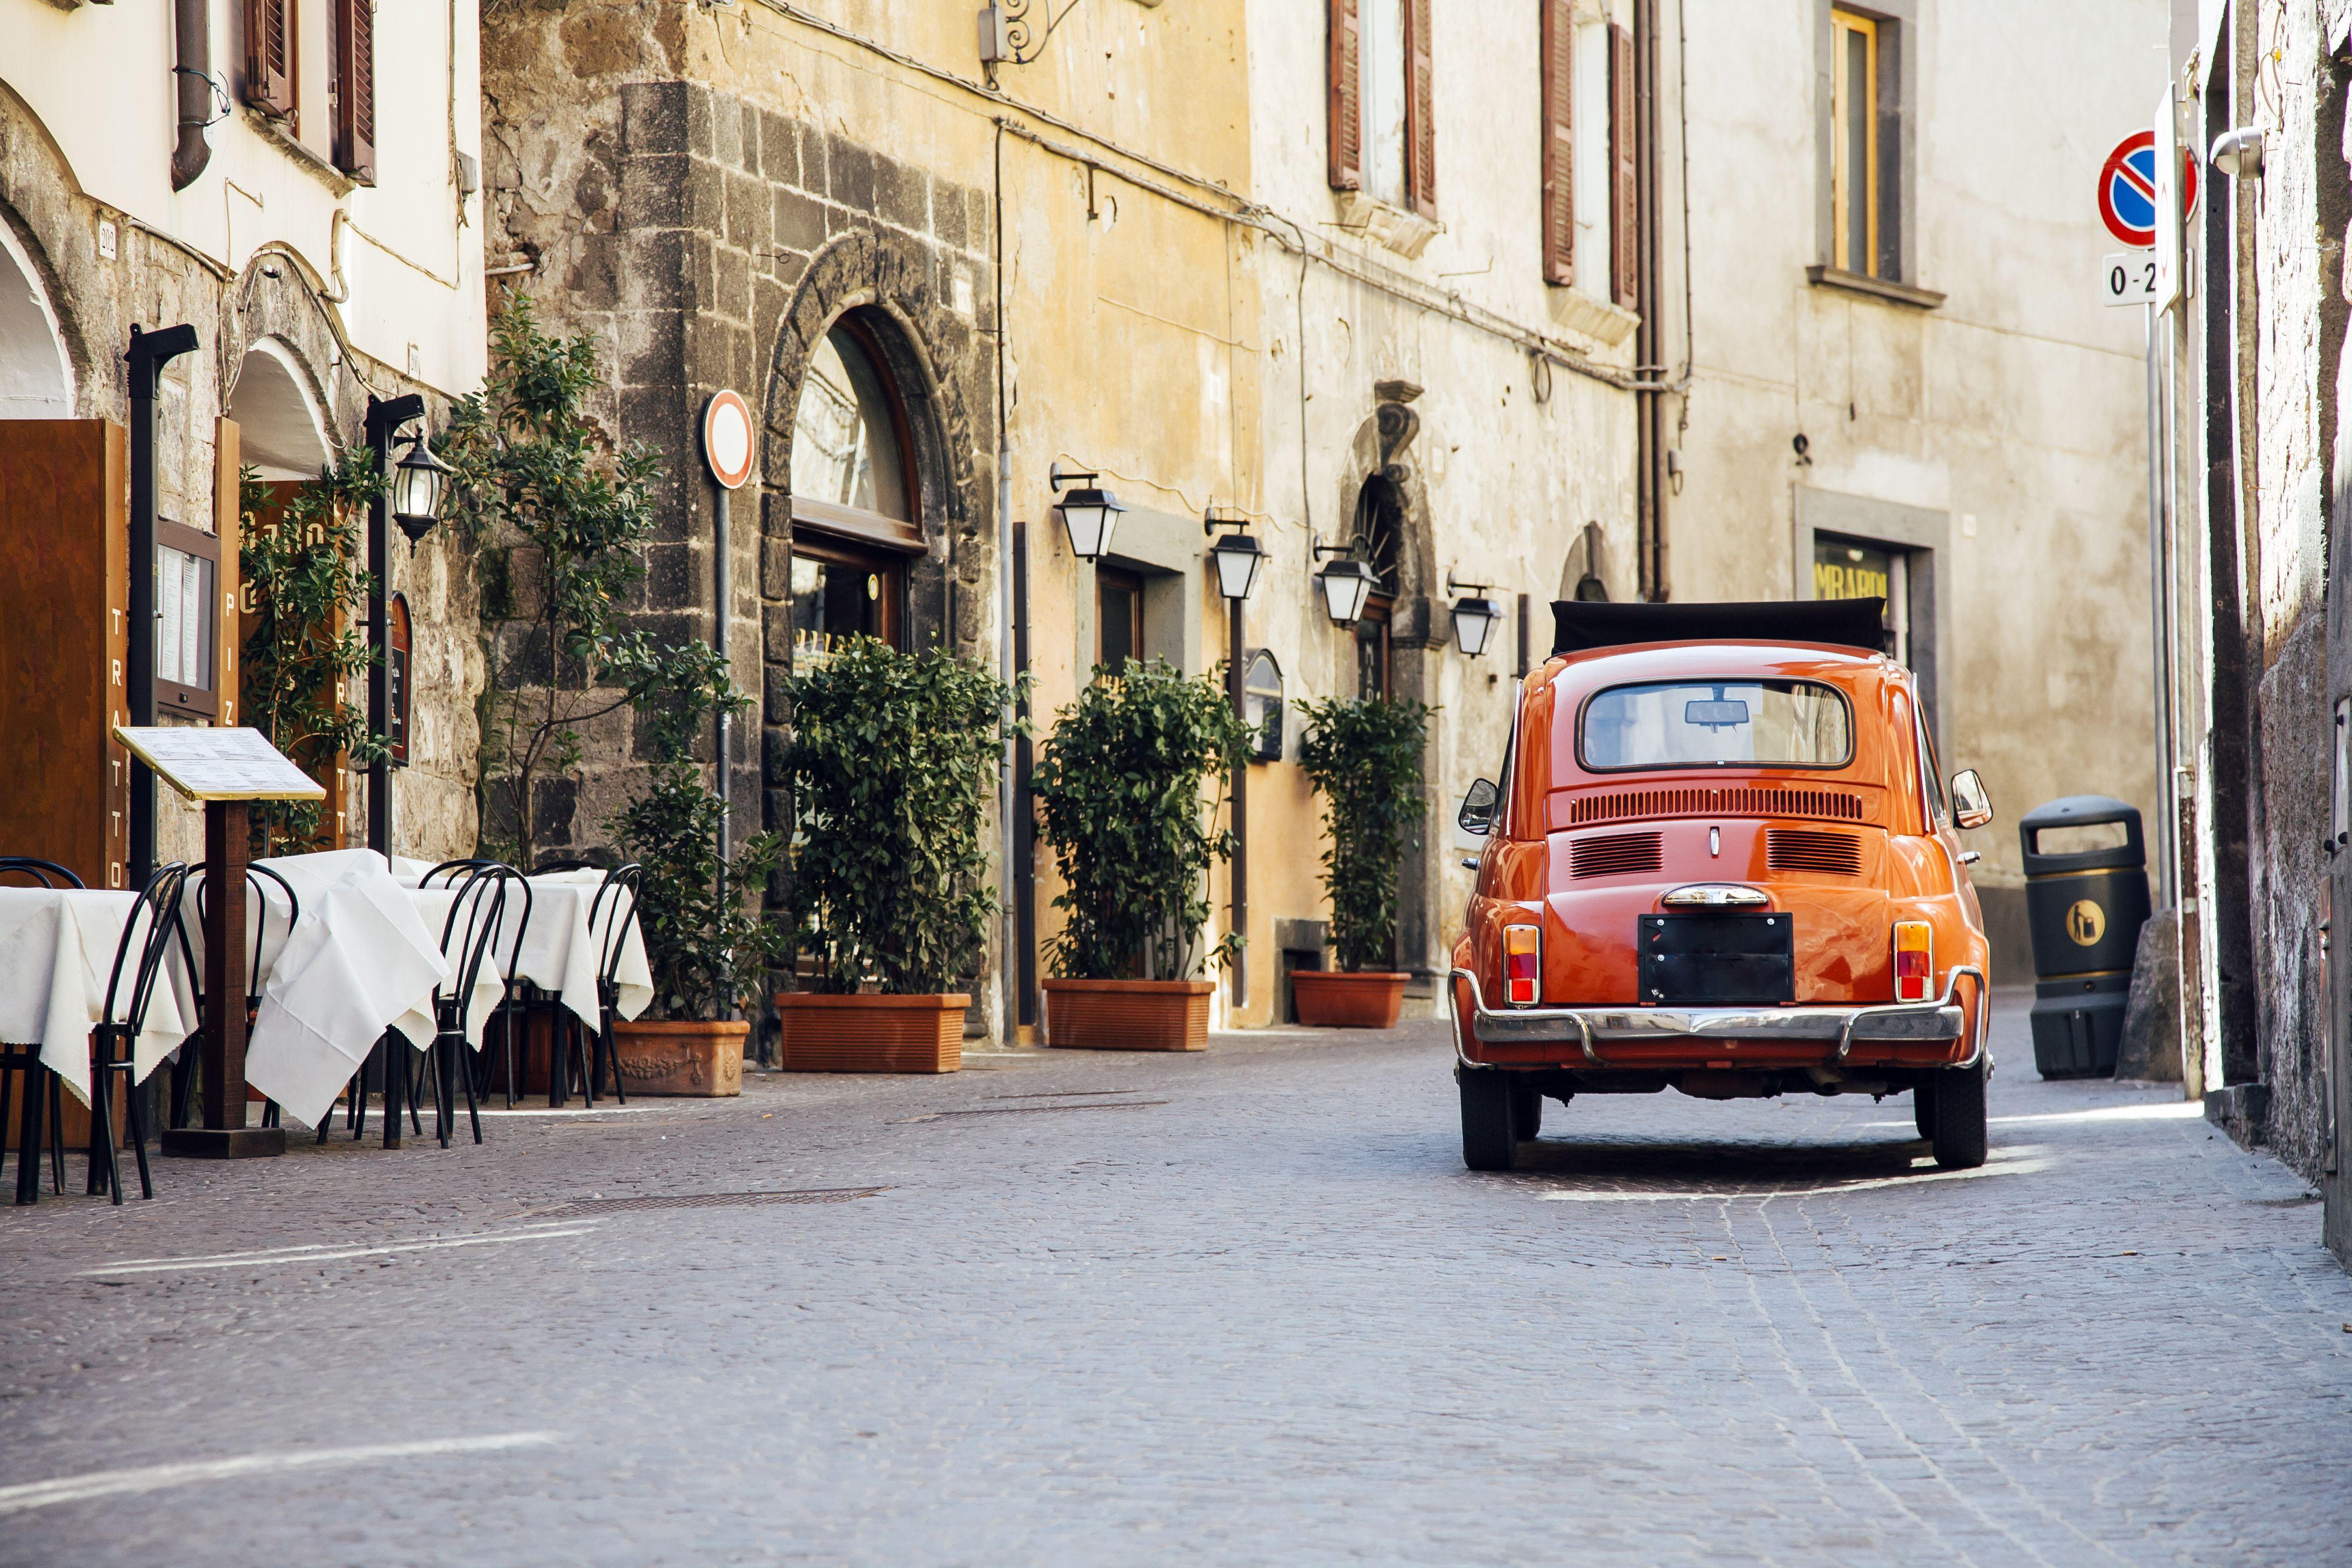 Viejo auto clásico rojo en la calle angosta de Italia